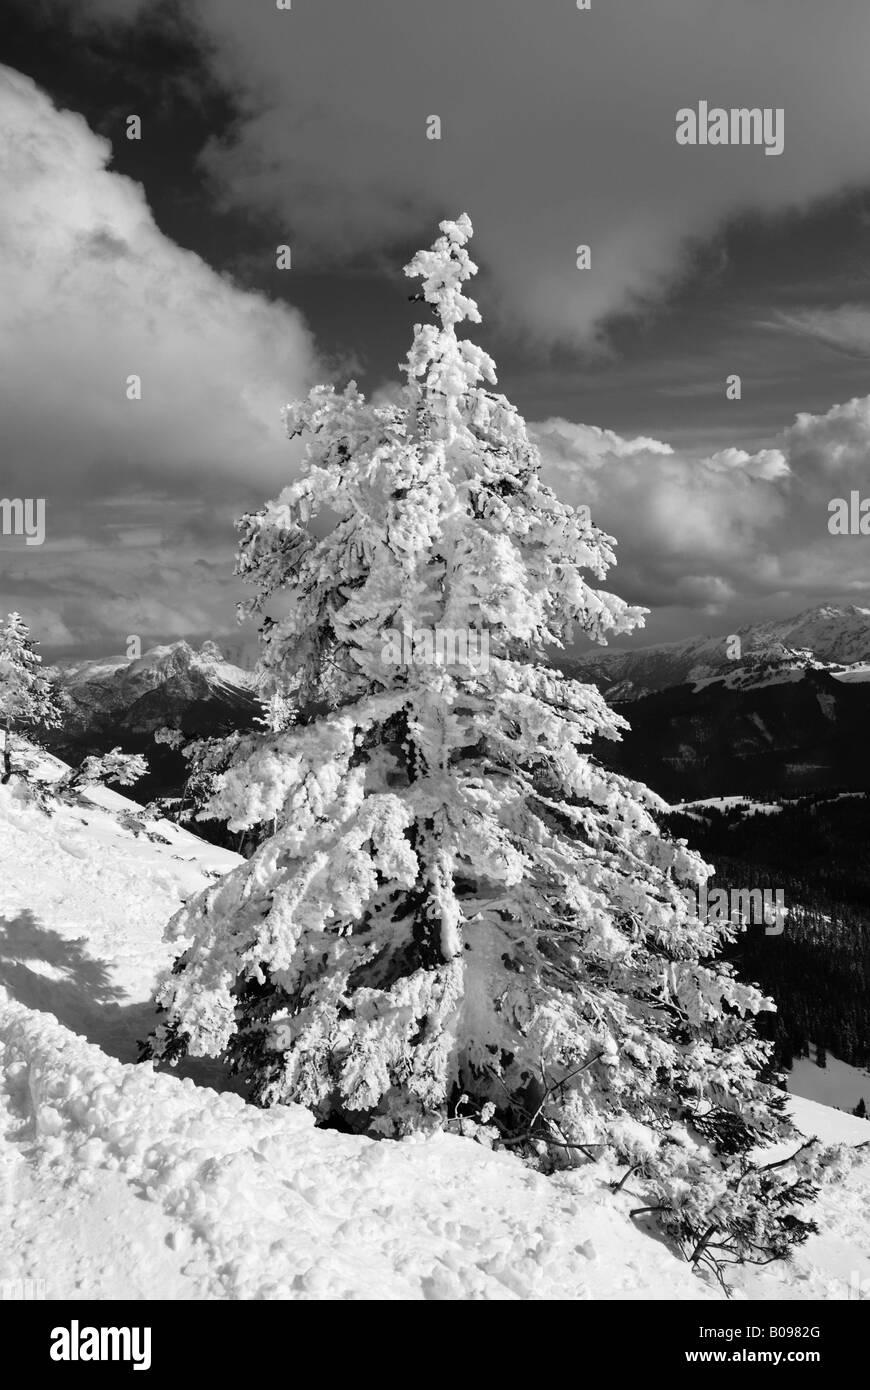 Snow-covered spruce tree (Picea), high Alps, Chiemgau, Bavaria, Germany - Stock Image